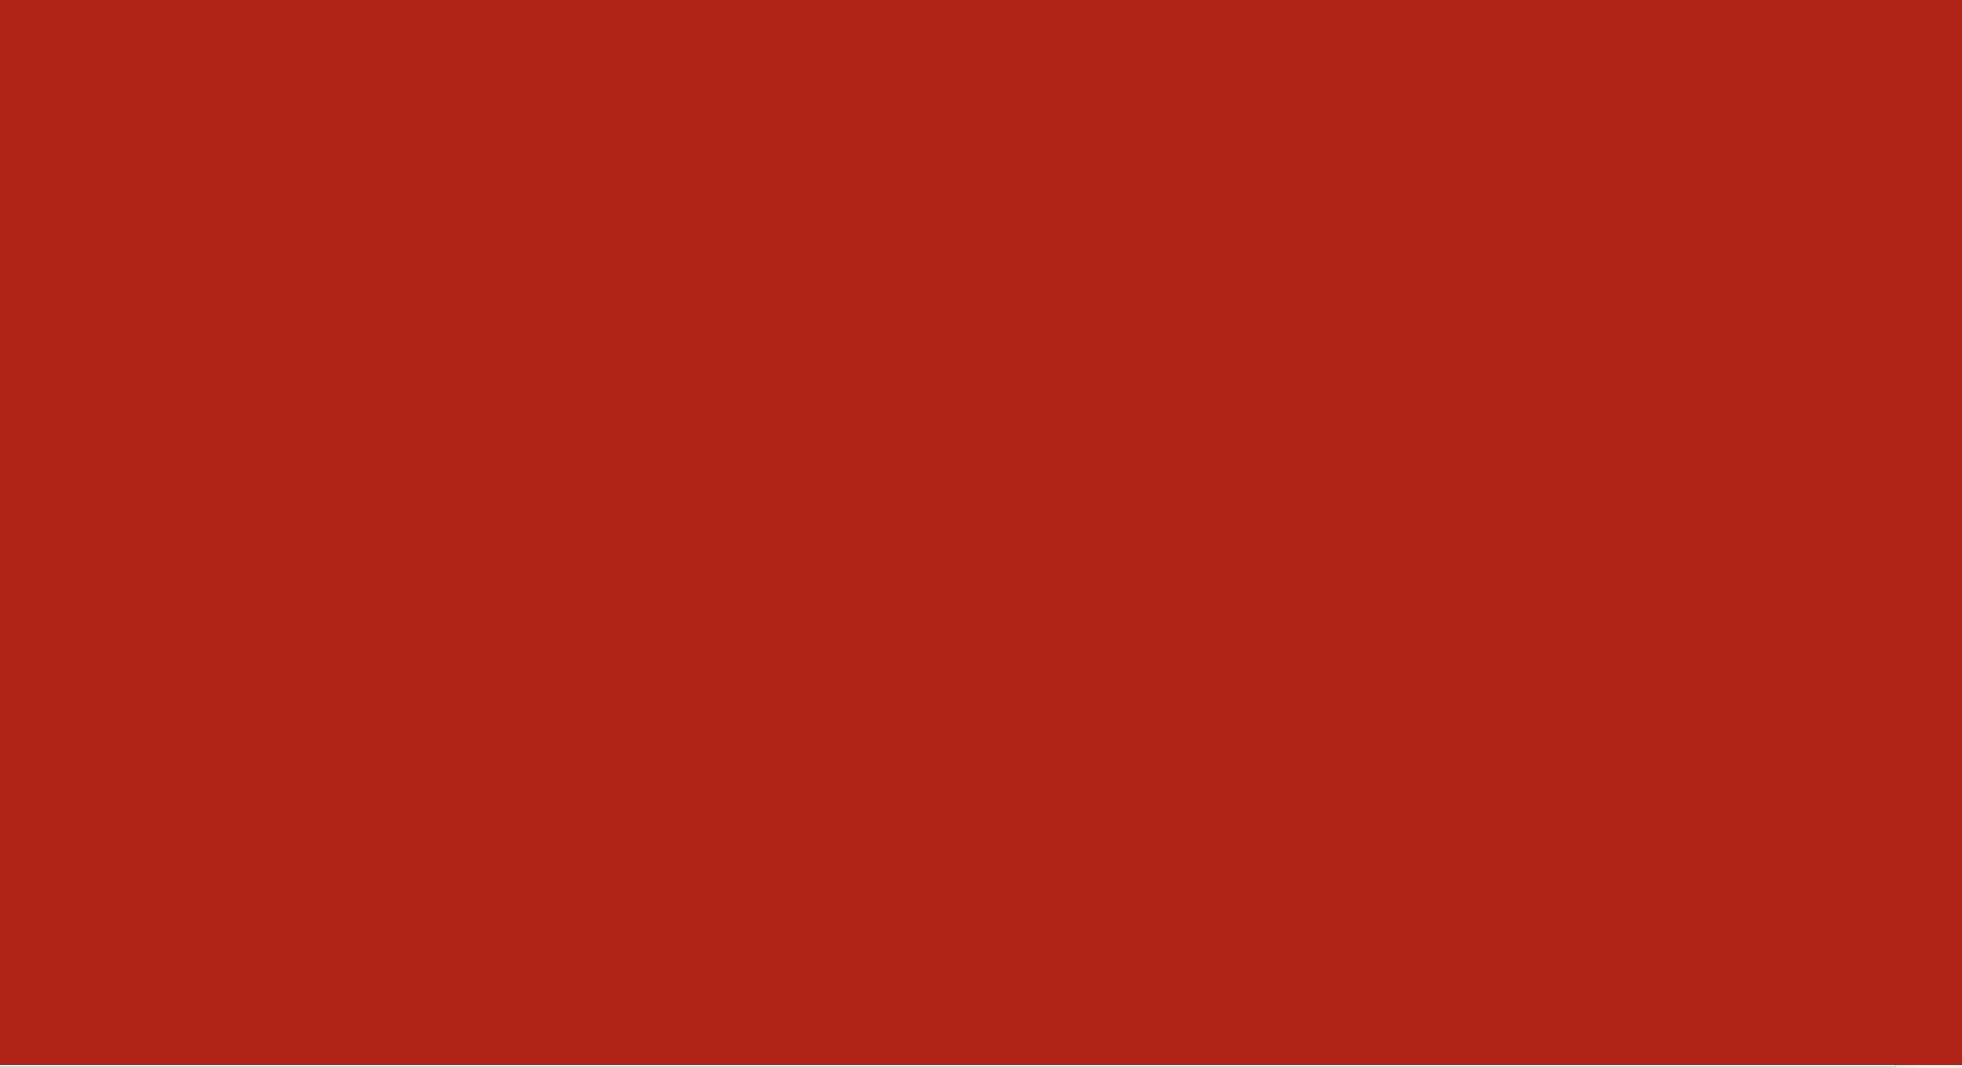 CA Foundation Logical Reasoning May 2022 | Google Drive cover